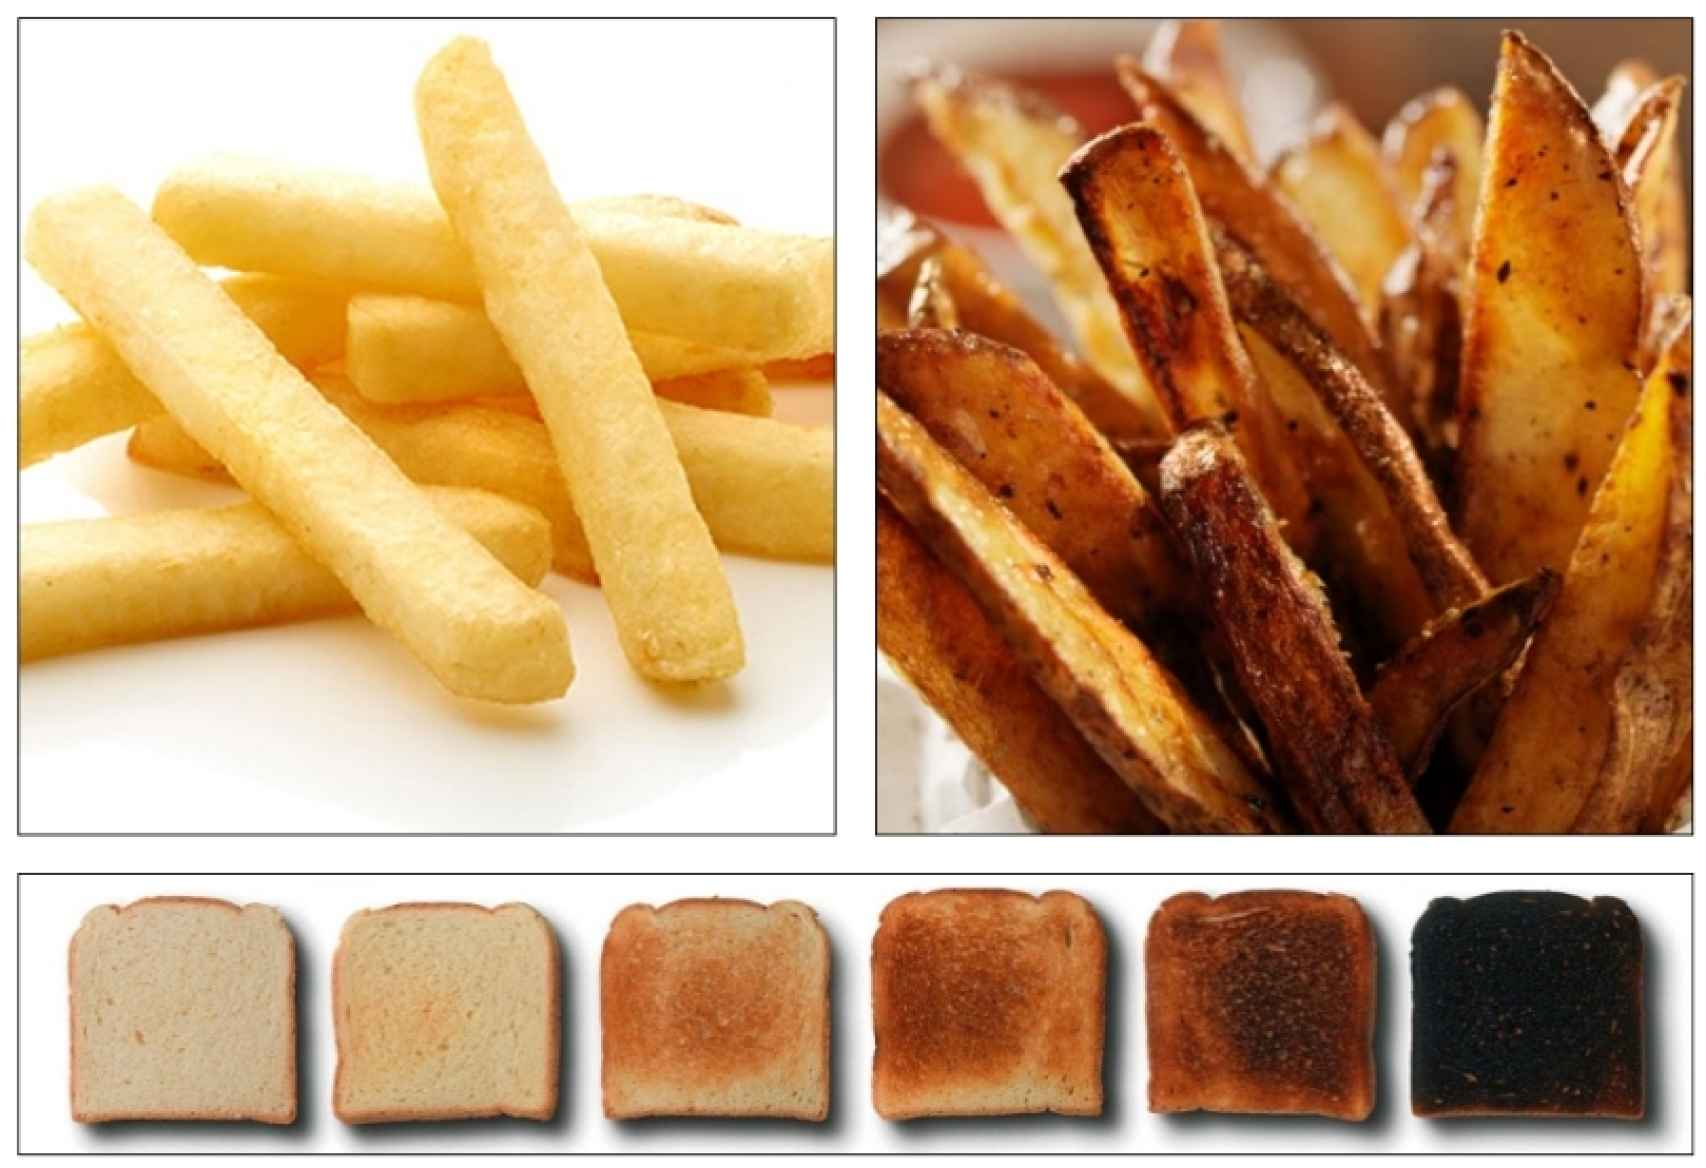 Al freír o tostar a altas temperaturas aparece la acrilamida.